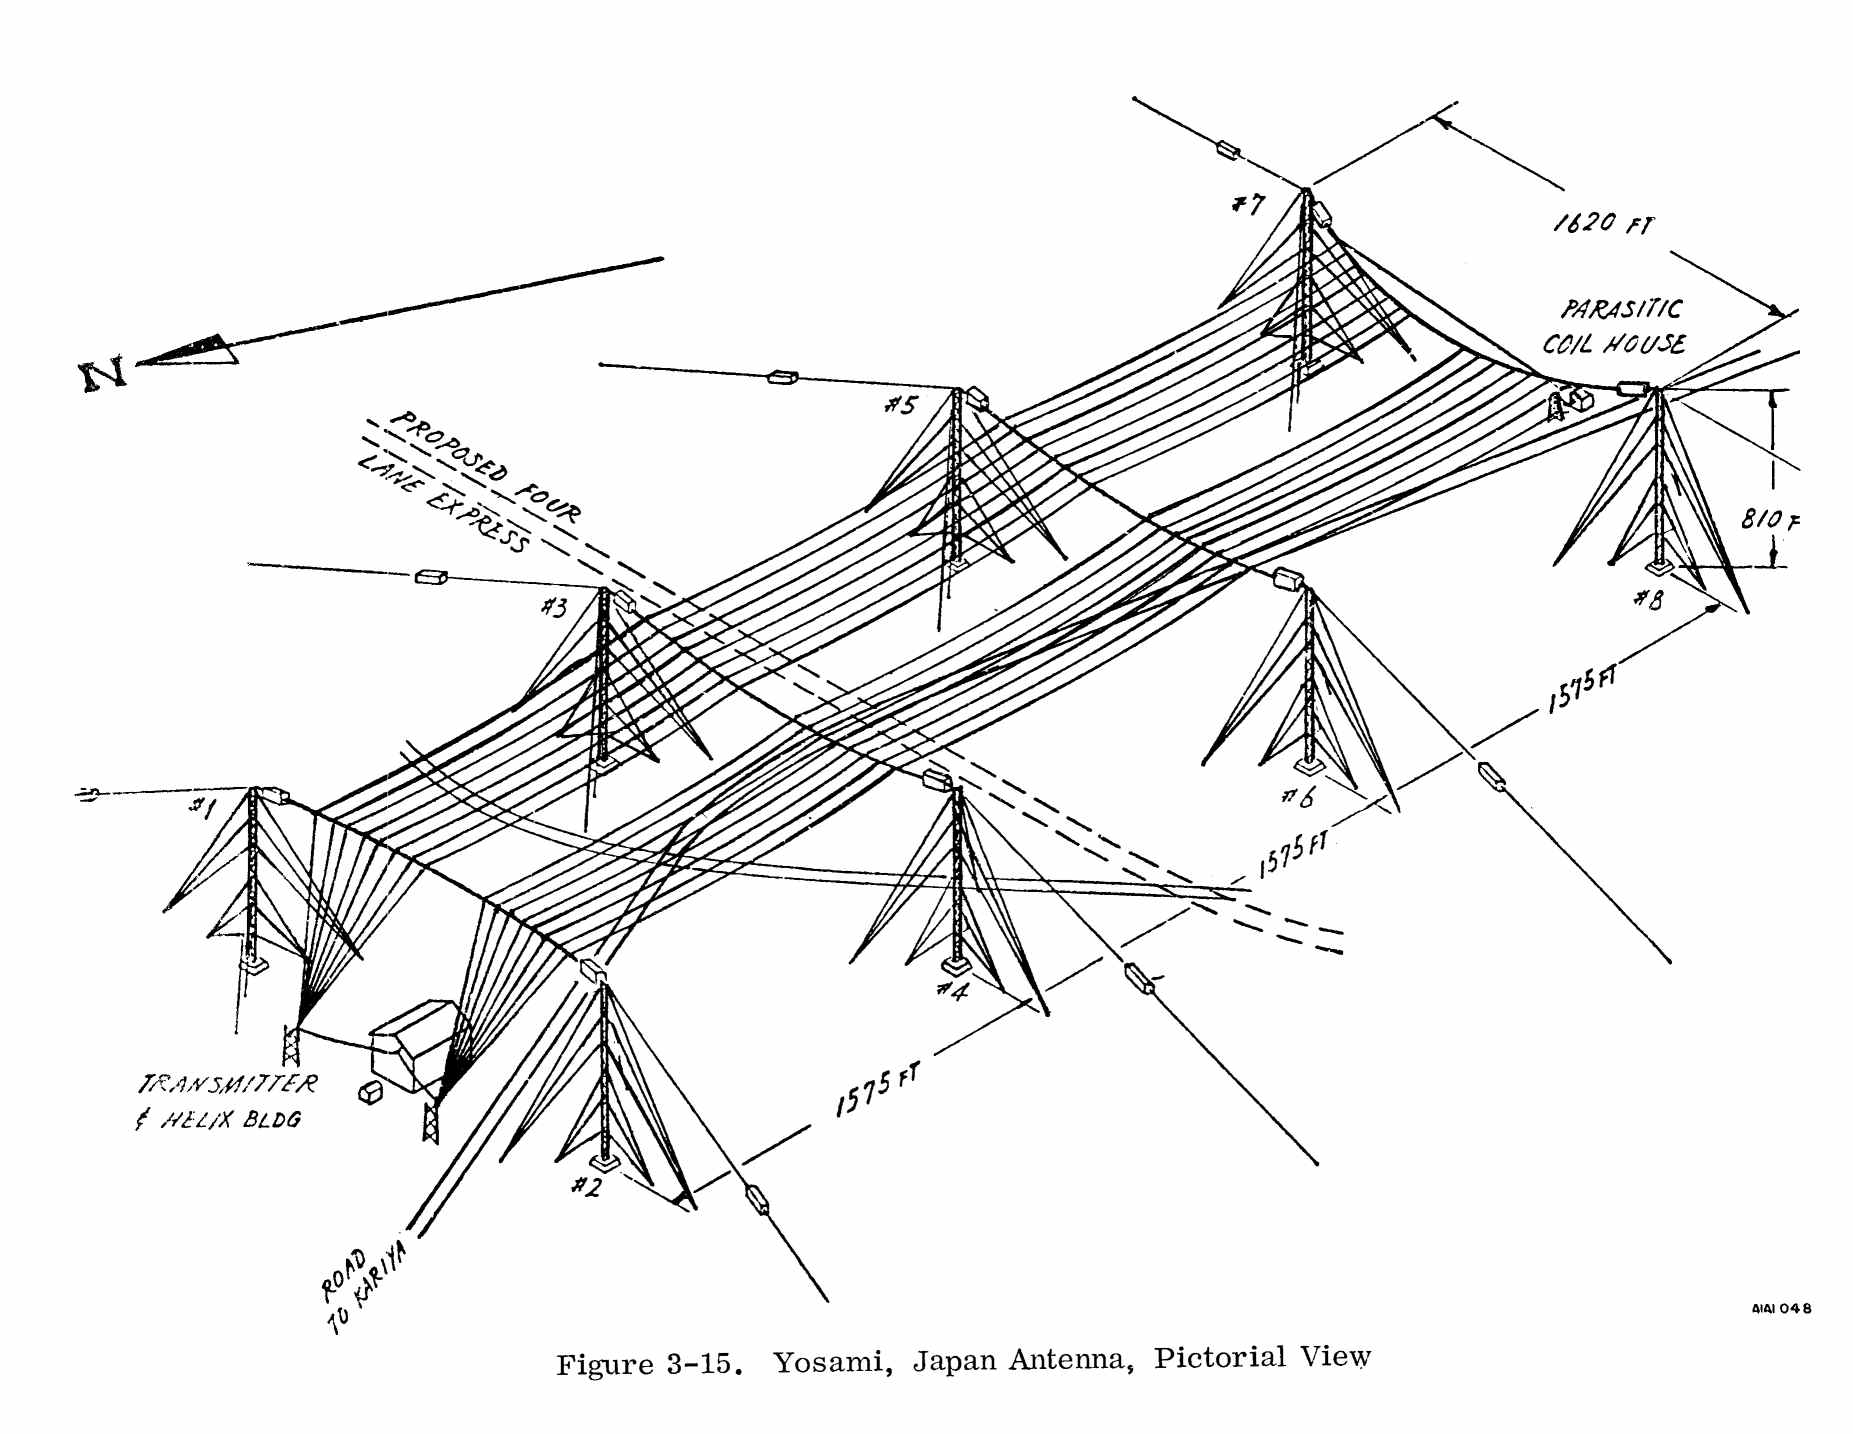 Navy Shore Station Communication Antennas